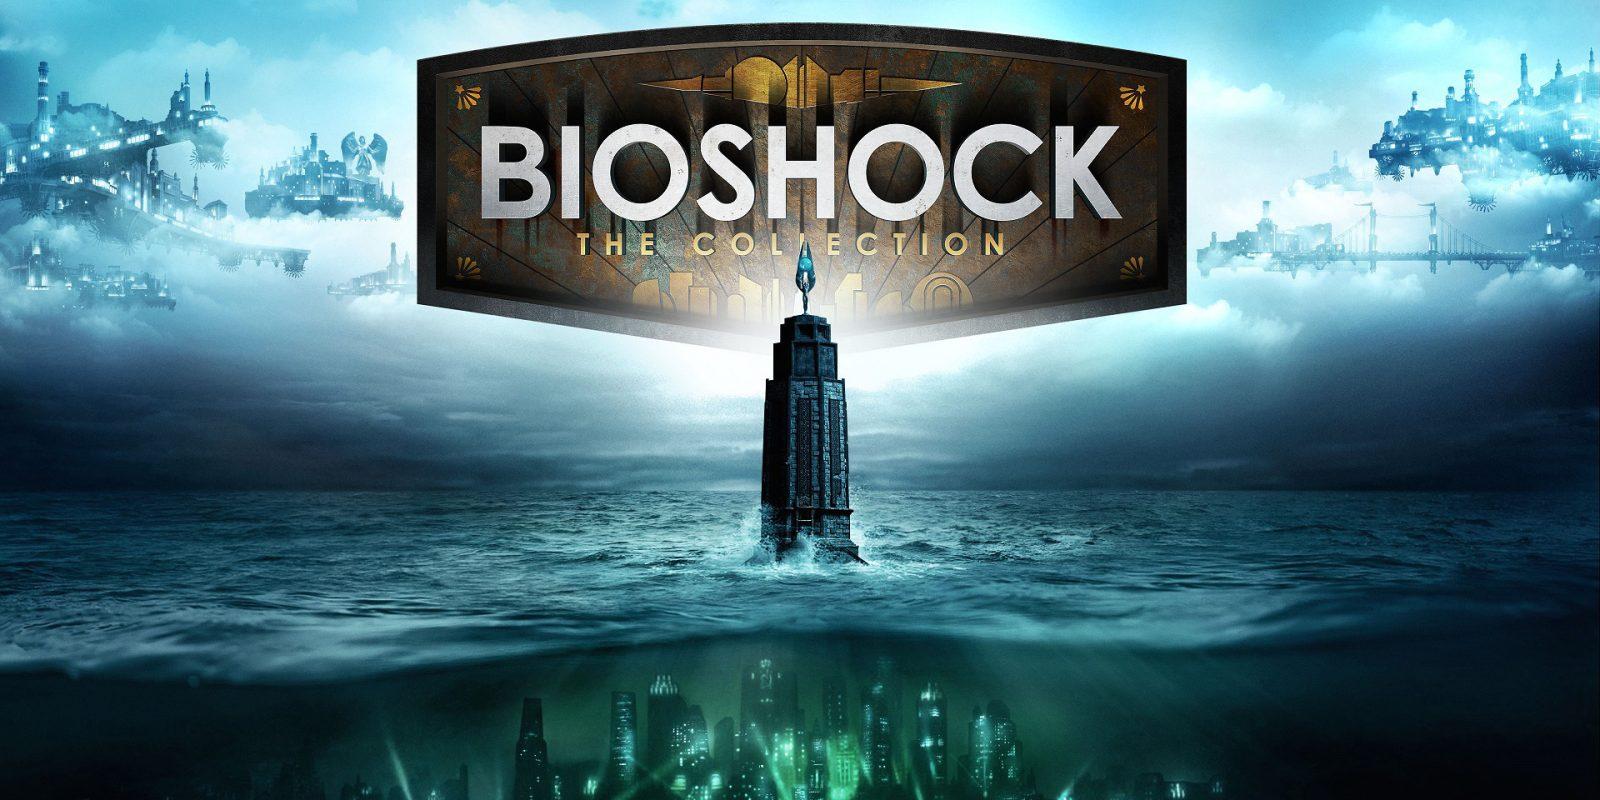 Digital PS4 games from $2.50: BioShock Collection, Witcher 3, PvZ Garden Warfare 2, more